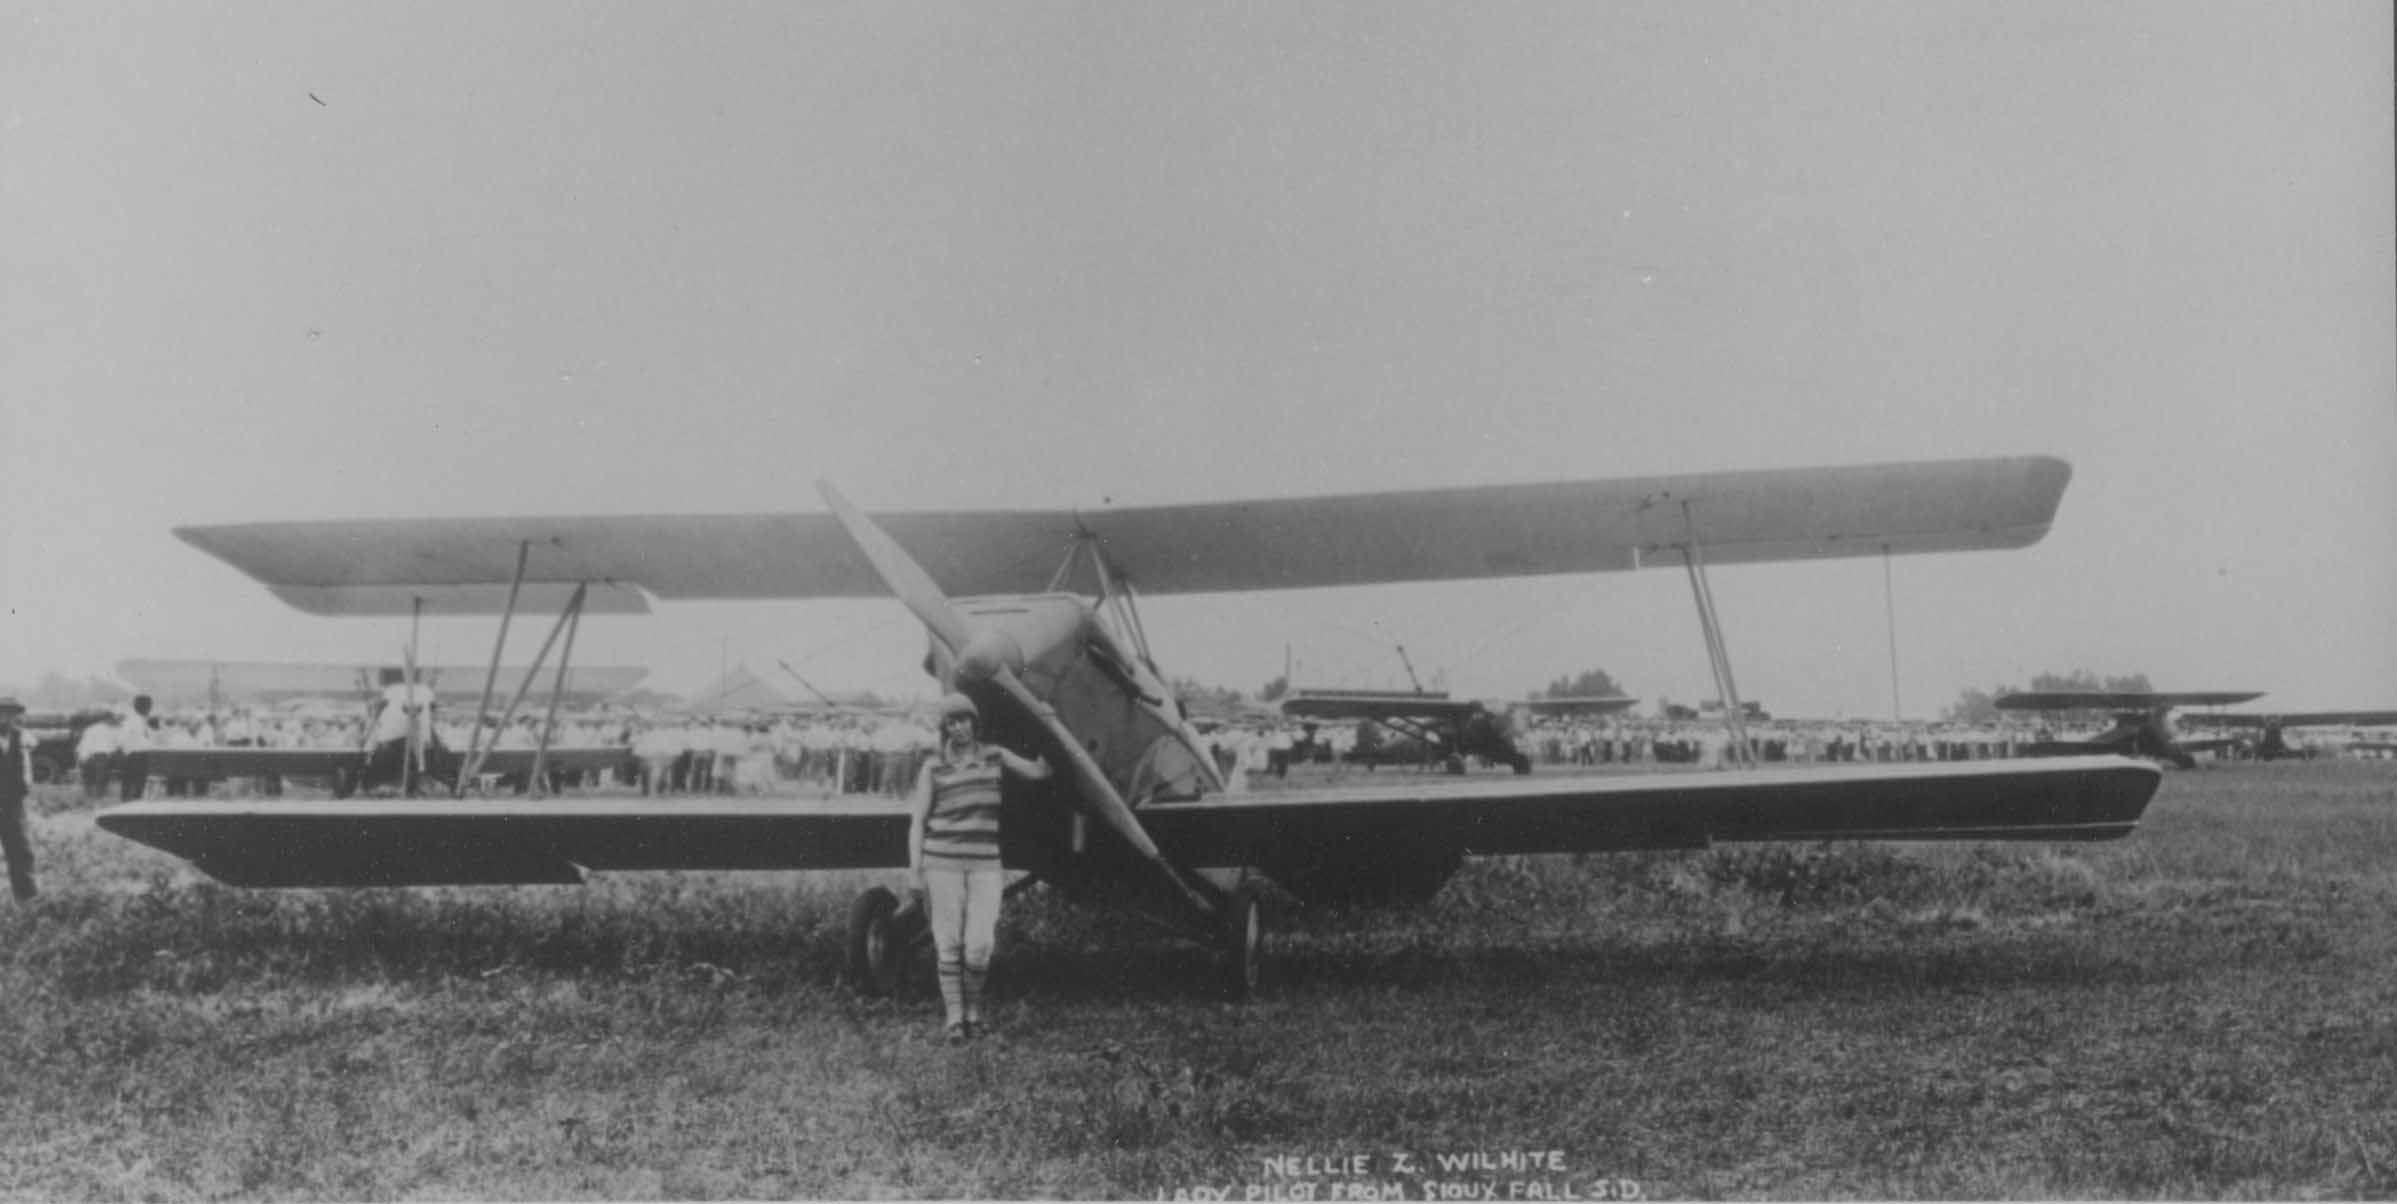 May 2021-South Dakota's First Female Pilot, Nellie Zabel Willhite